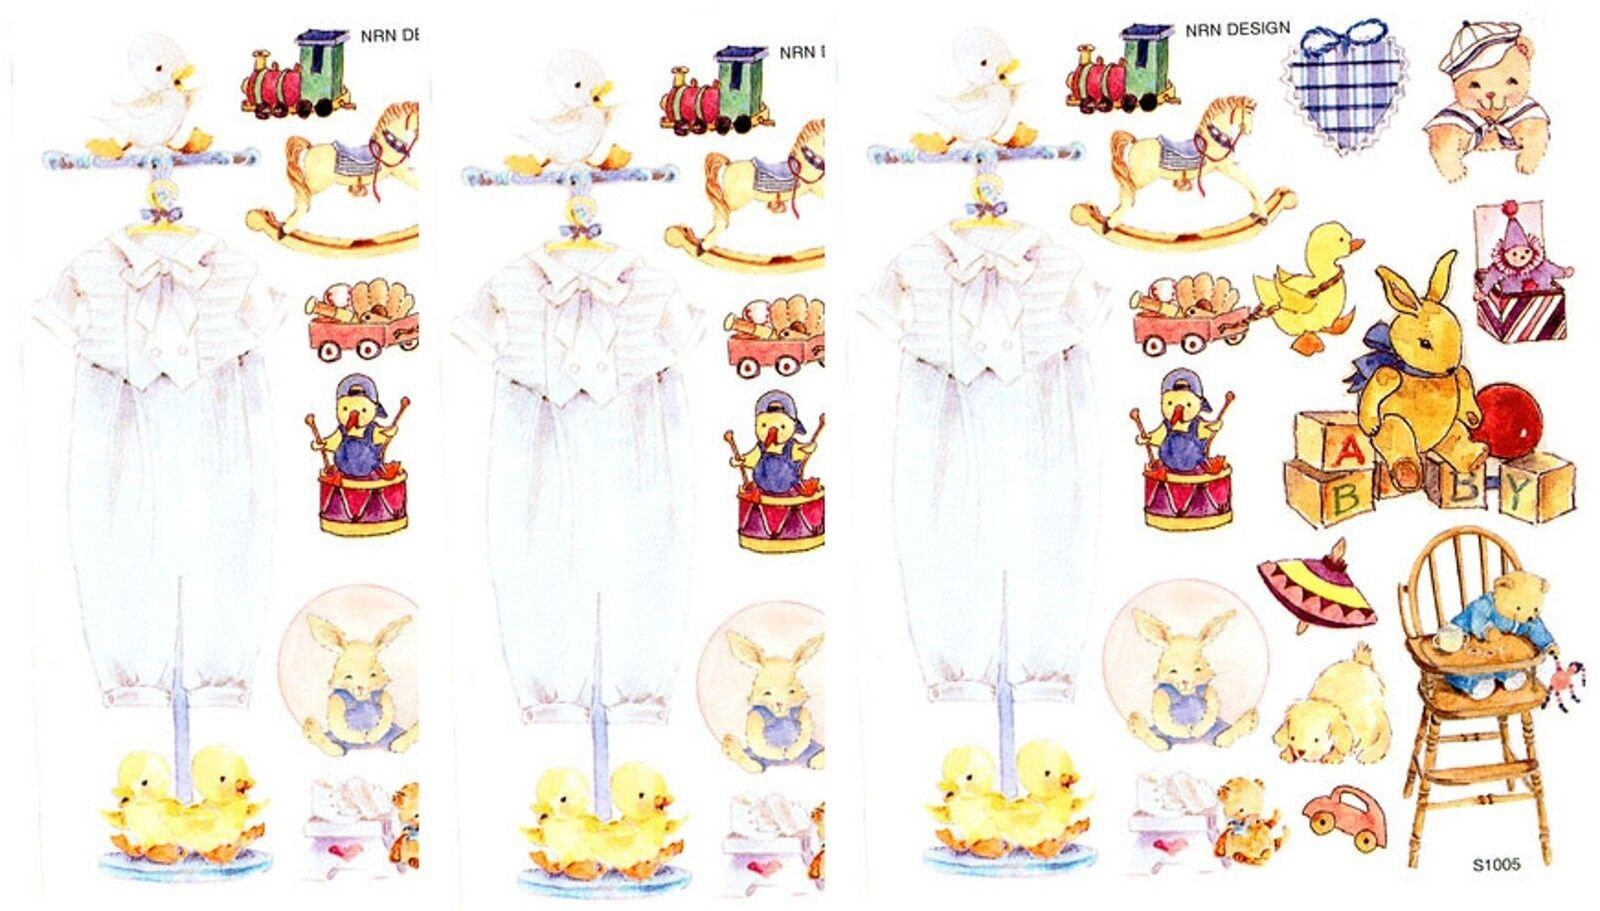 Nrn Designs Baby Boy Classic Scrapbook Stickers 3 Sheets Ebay